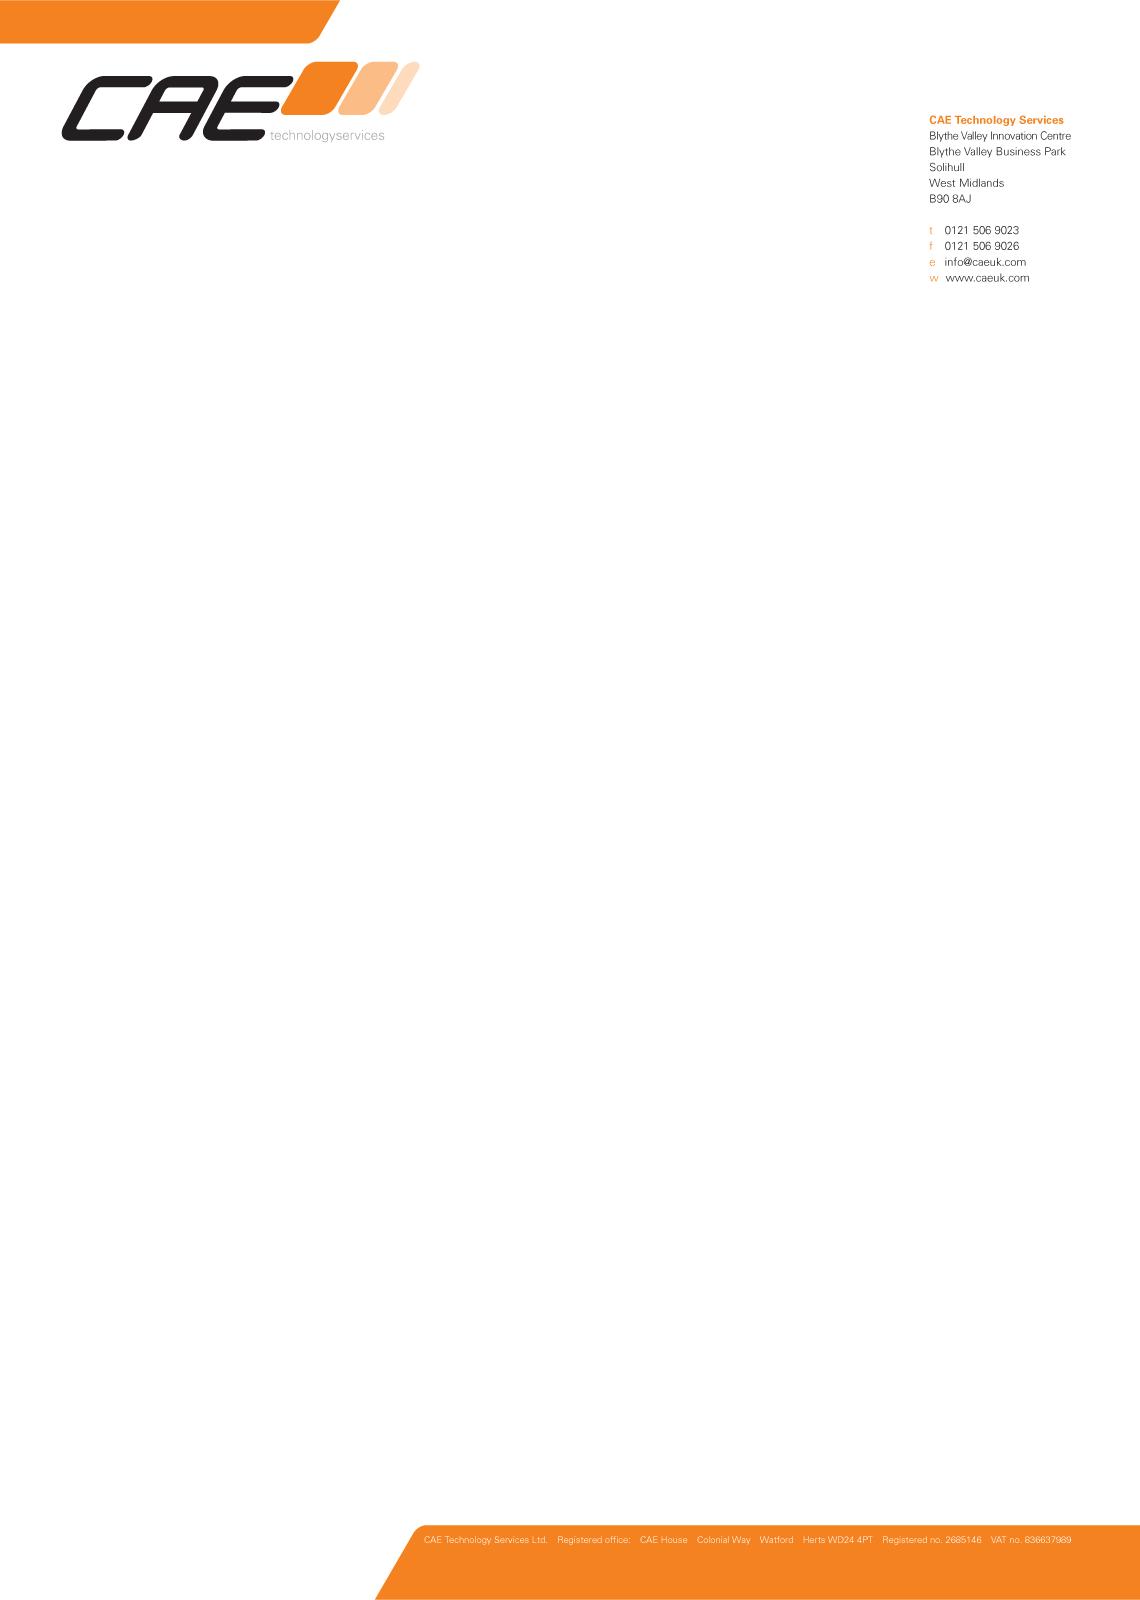 cae-letterhead